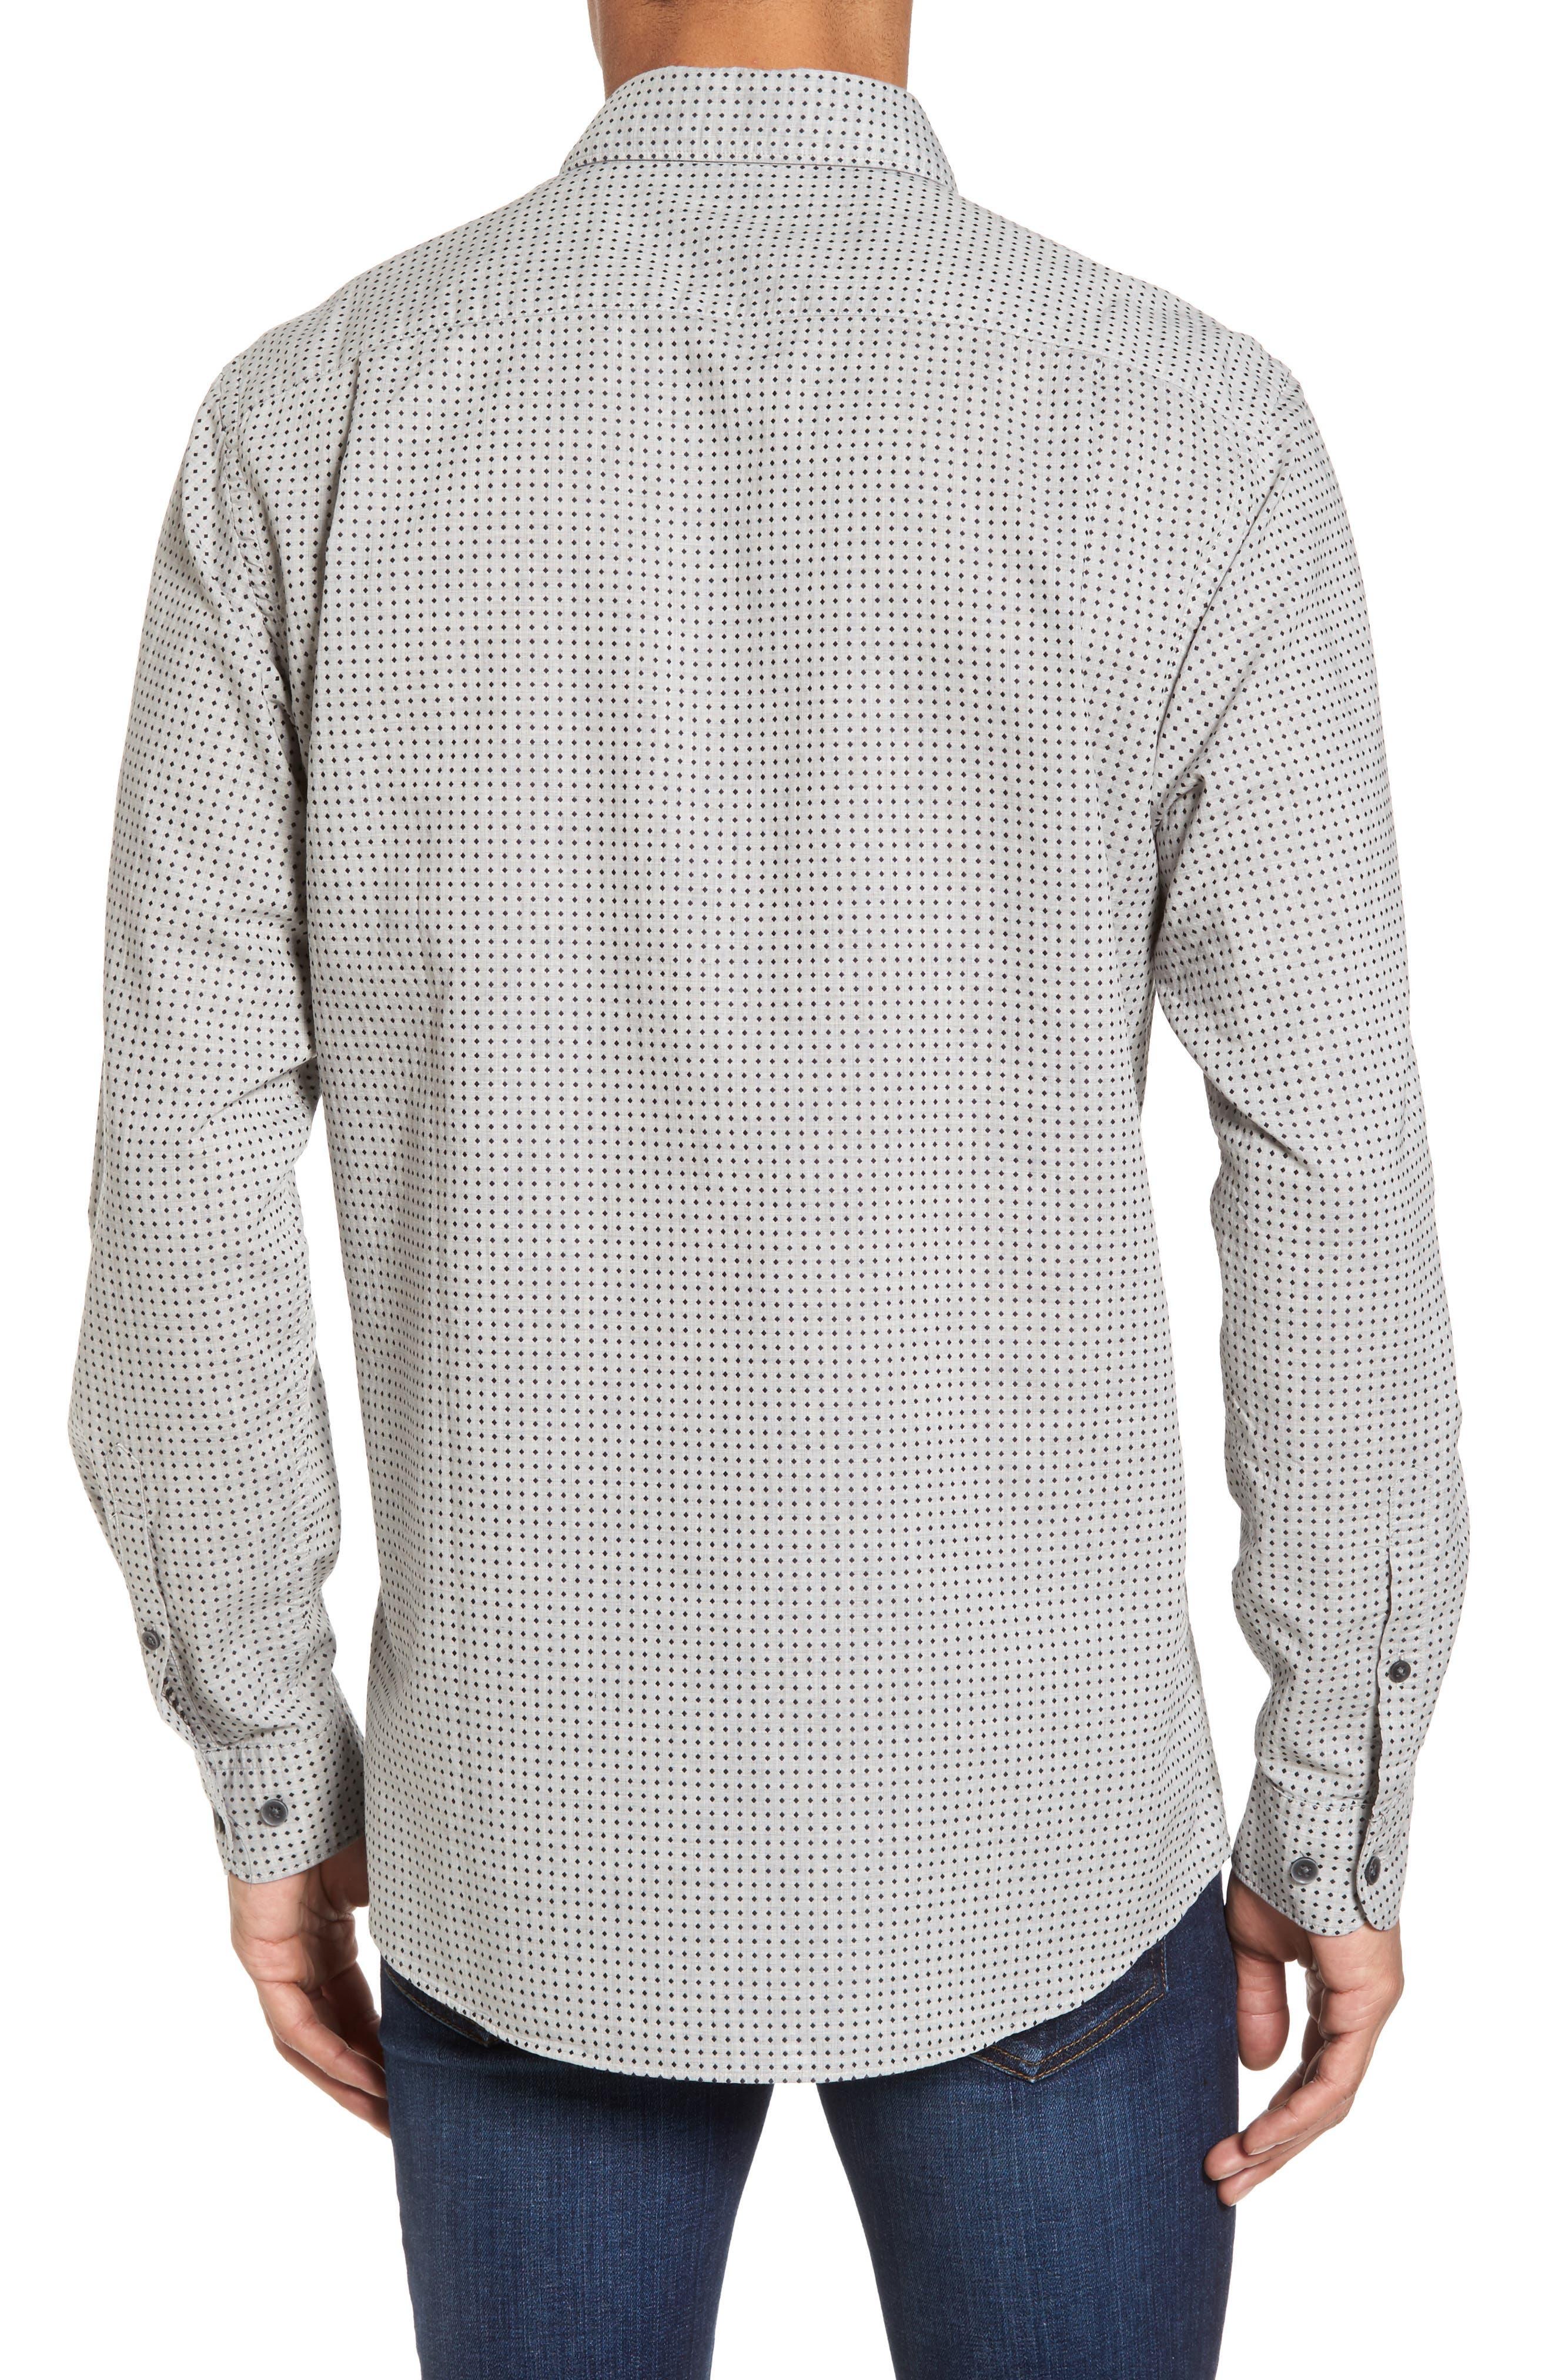 Judgeford Slim Fit Jacquard Sport Shirt,                             Alternate thumbnail 2, color,